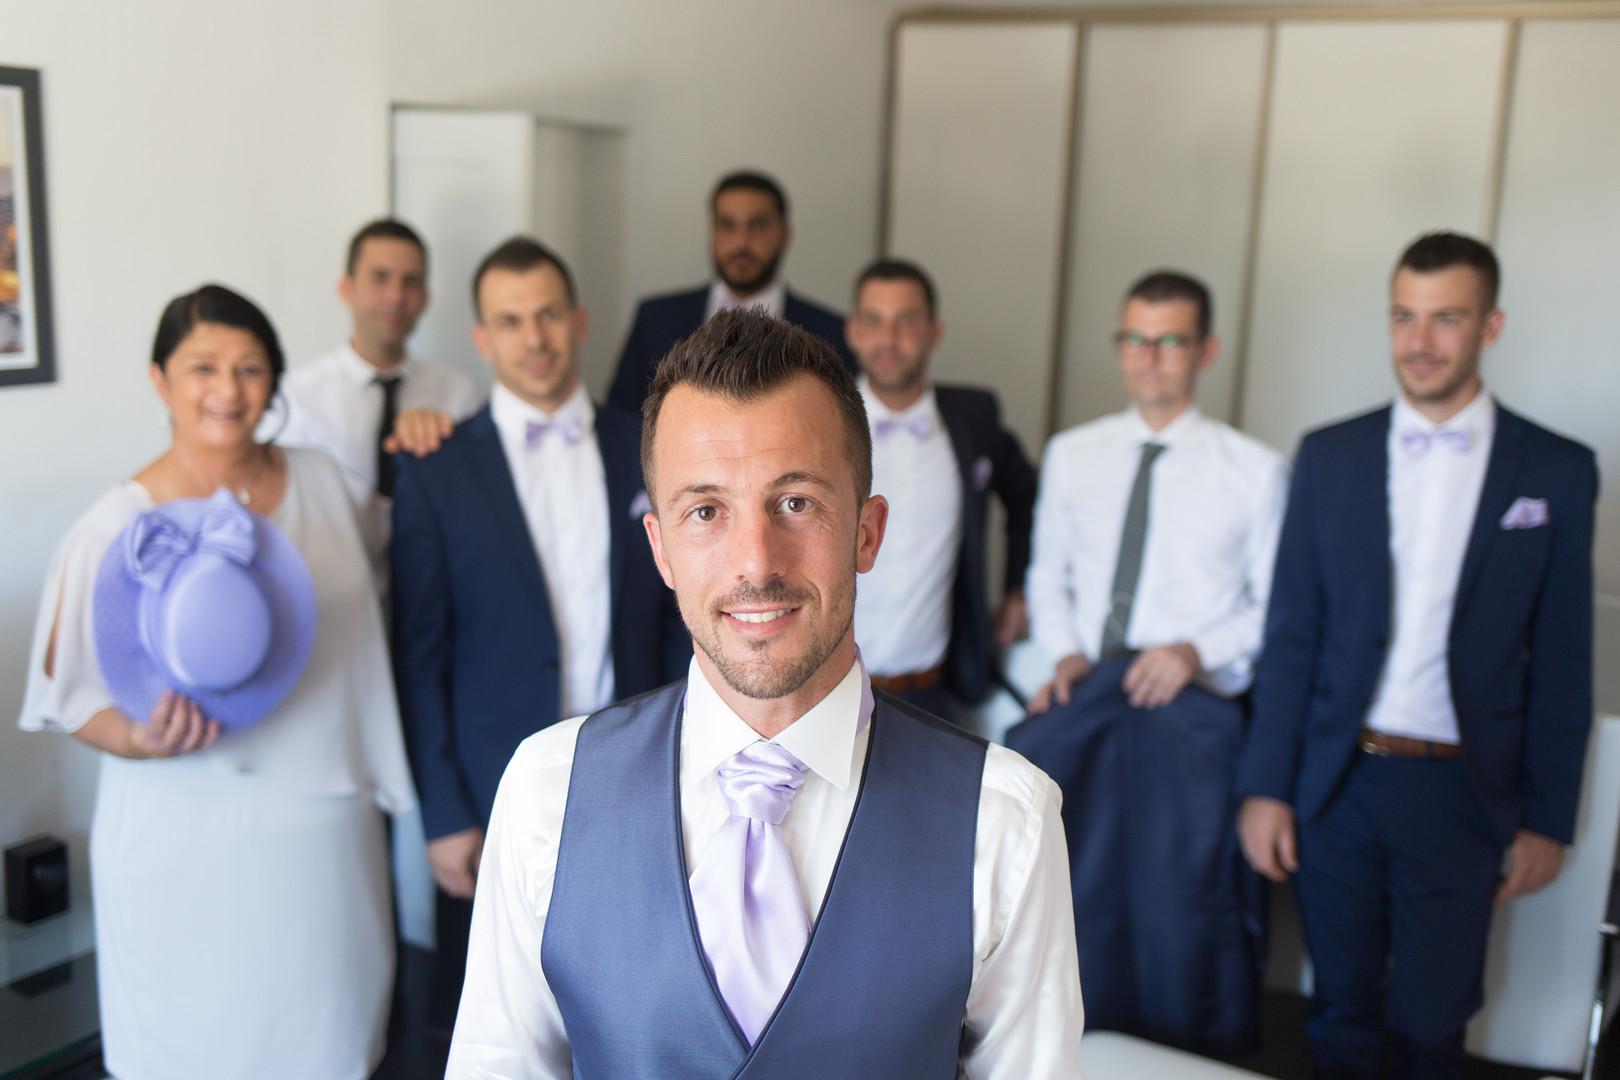 préparatifs family mariage wedding photography photographie